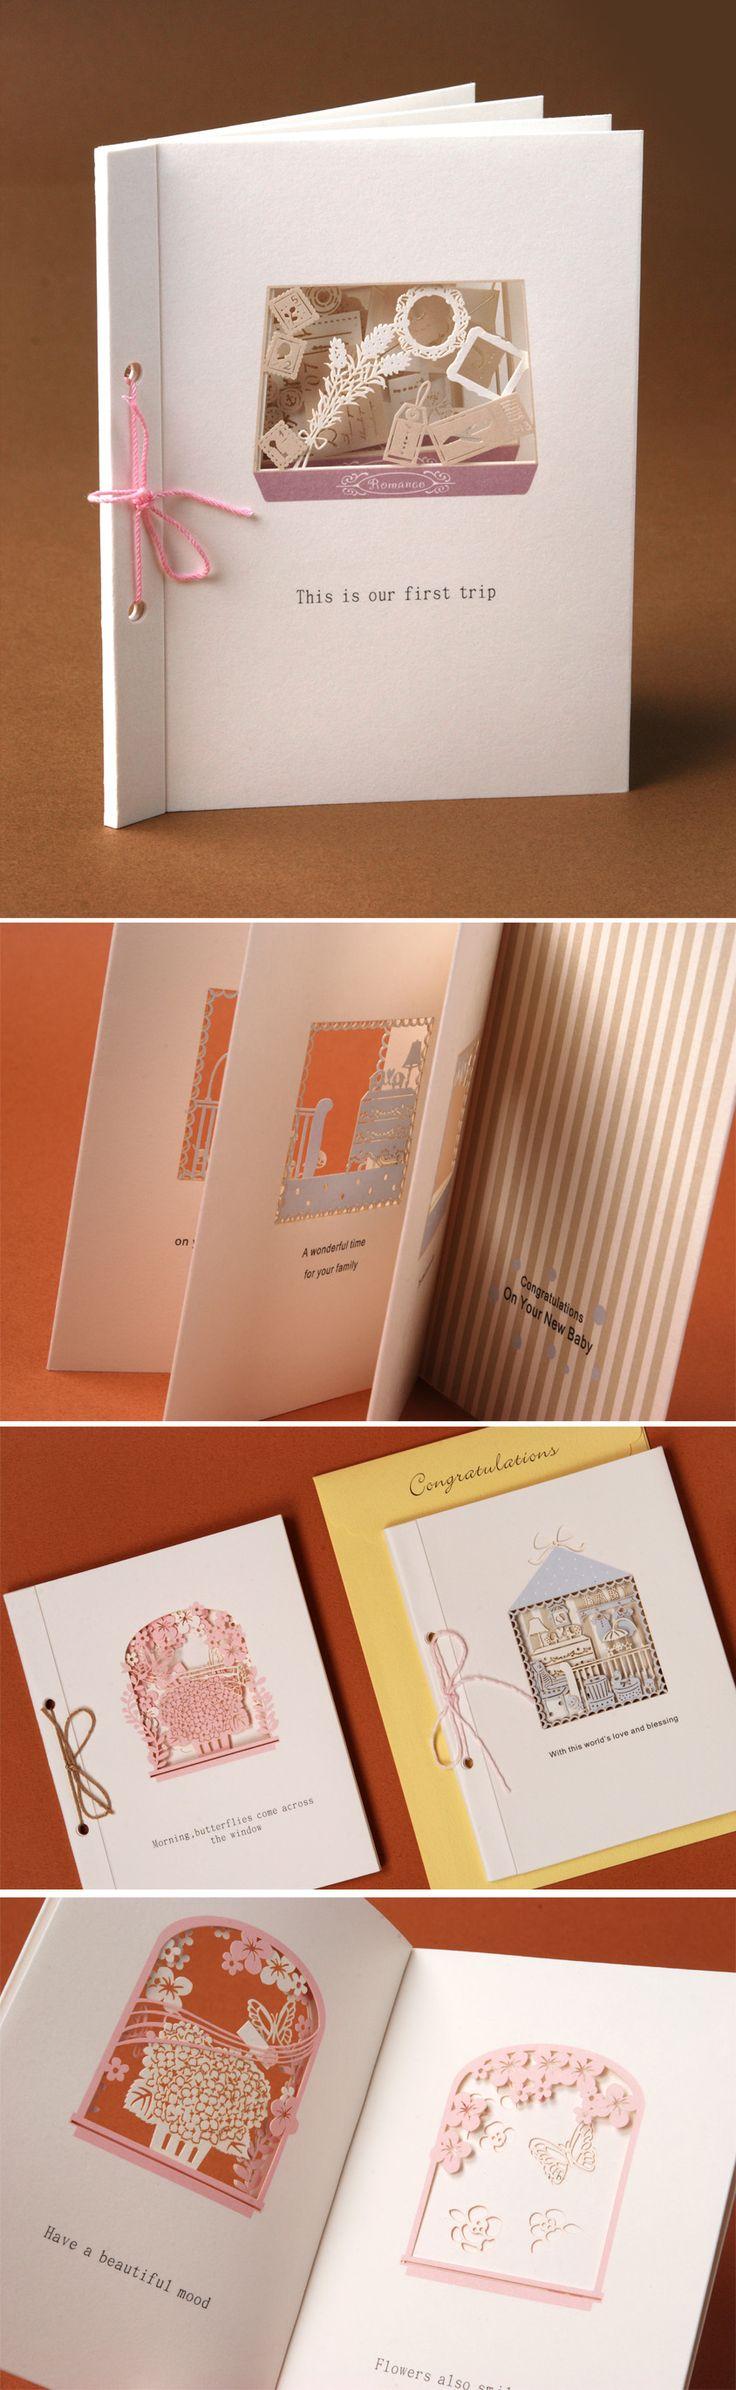 mini book wedding invitations uk%0A greeting card